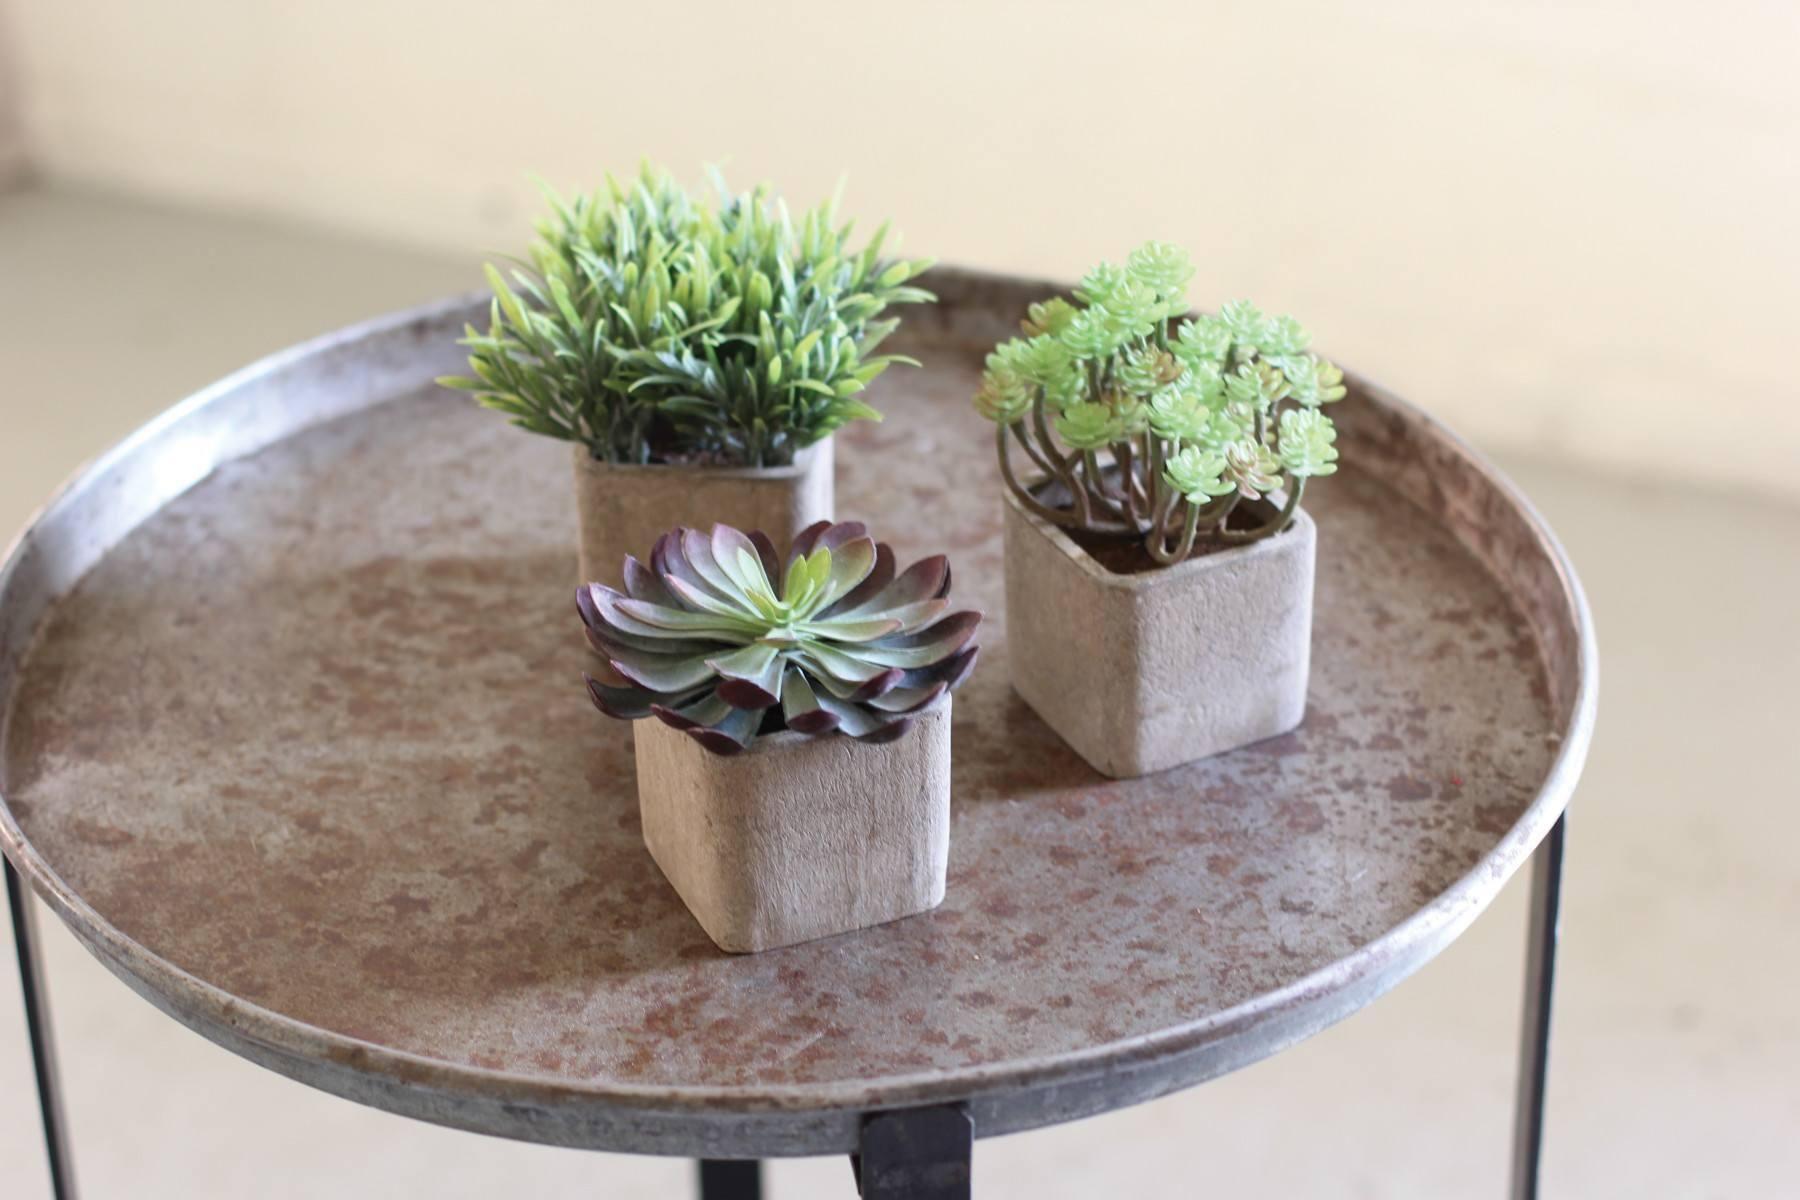 S 3 Small Artificial Succulents In Square Pots #4 5 12